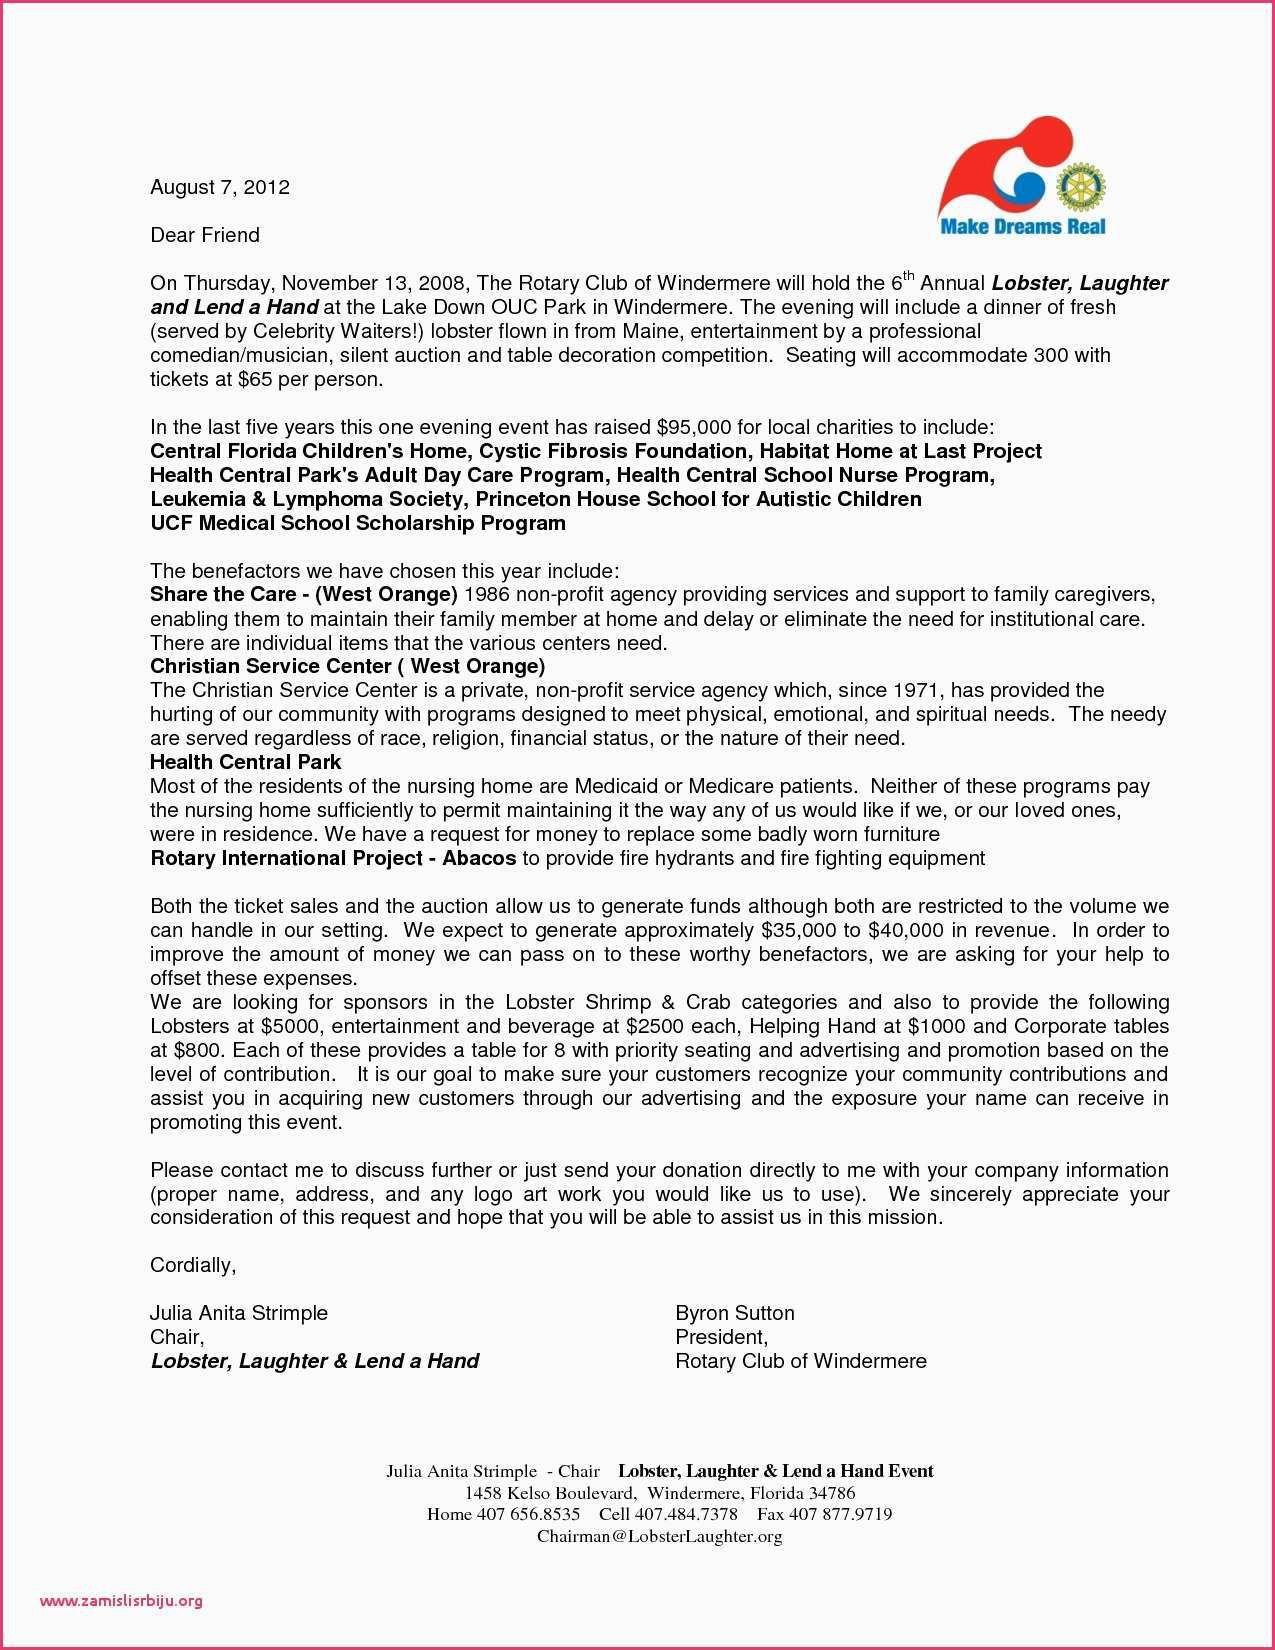 006 Wondrou Silent Auction Donation Certificate Template High Definition Full